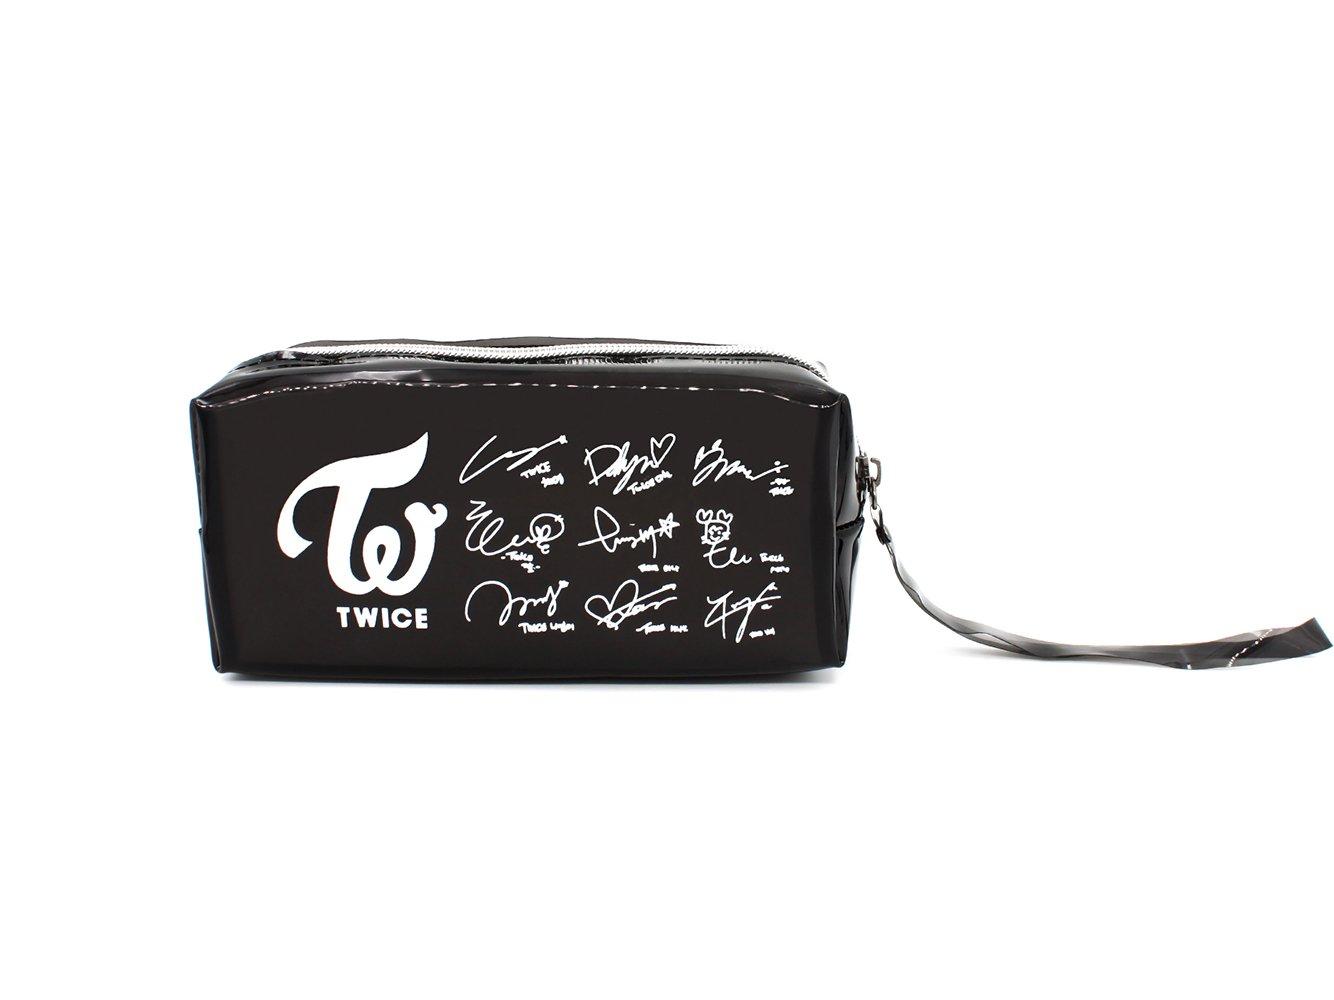 Fanstown BTS KPOP鉛筆ケース+ BTSロゴペンダントwith Signature PVCカード B0795DT94Y Pu-twice Pu-twice